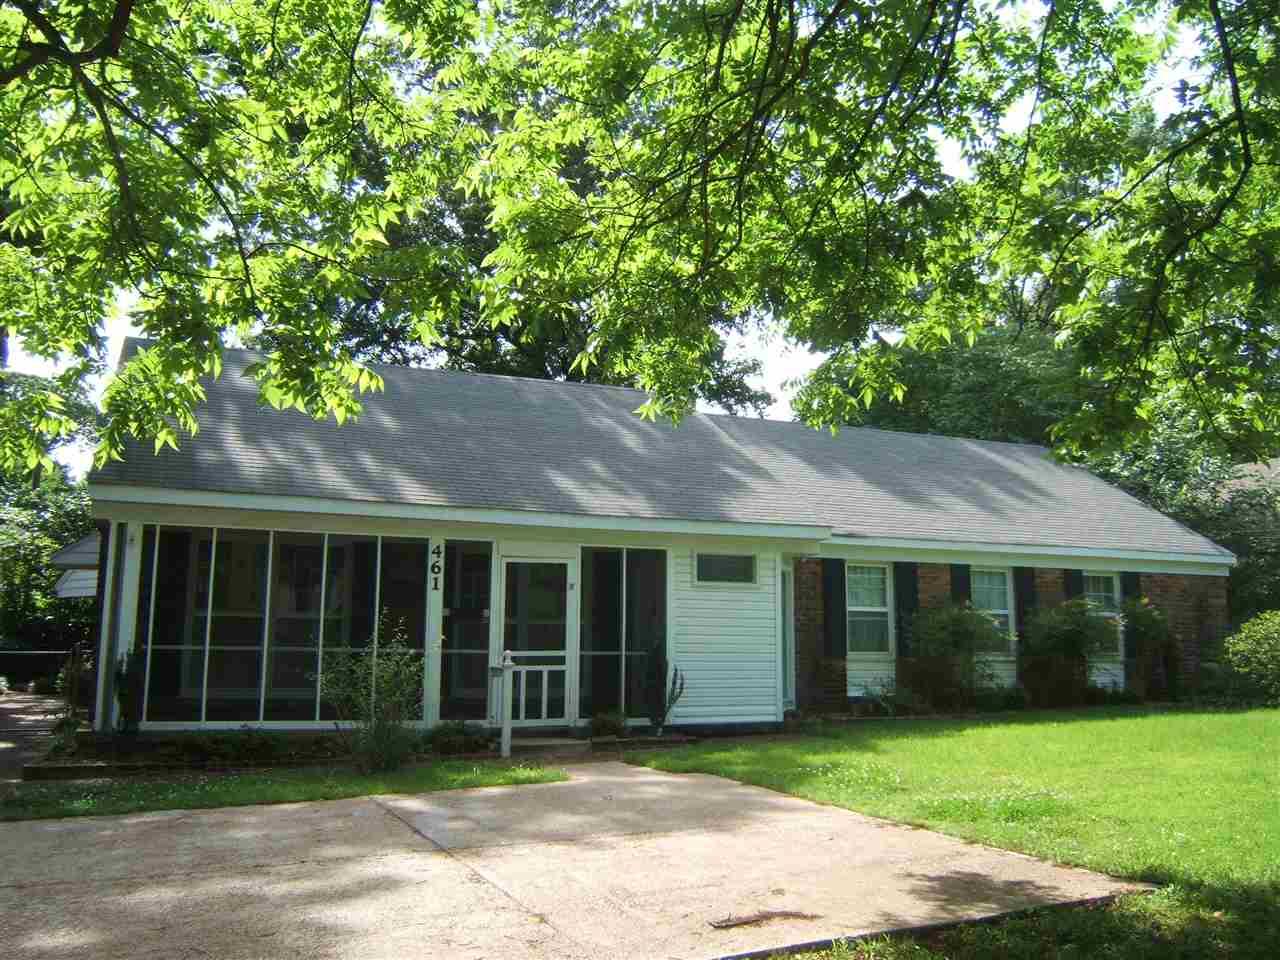 461 N Mendenhall, Memphis, TN 38117